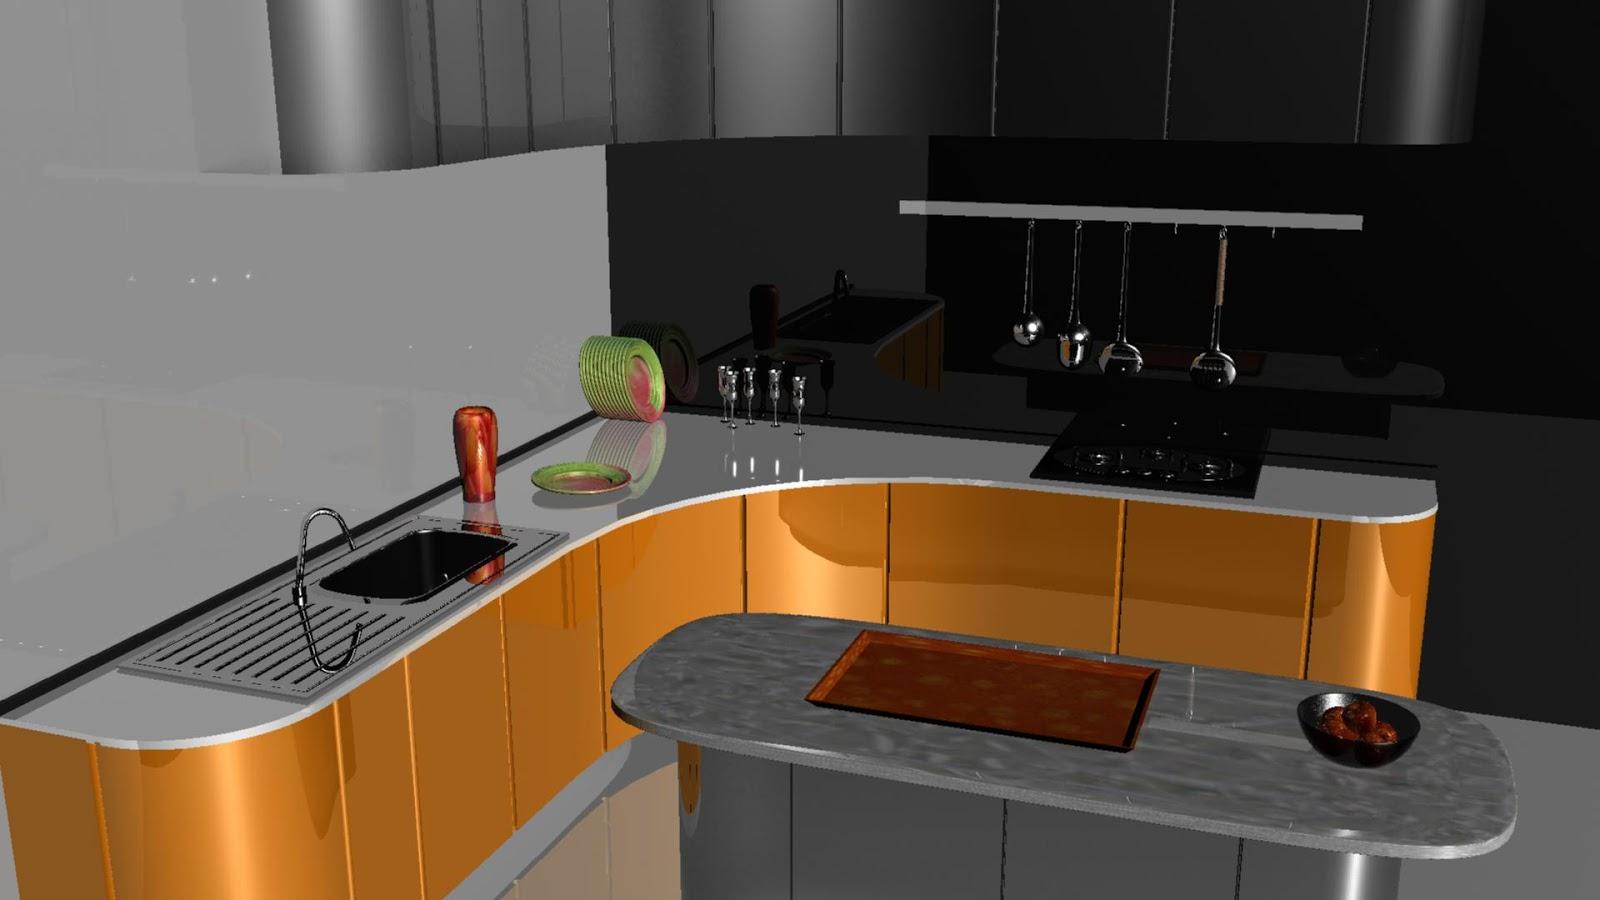 3d Modeling 0 2 Kitchen